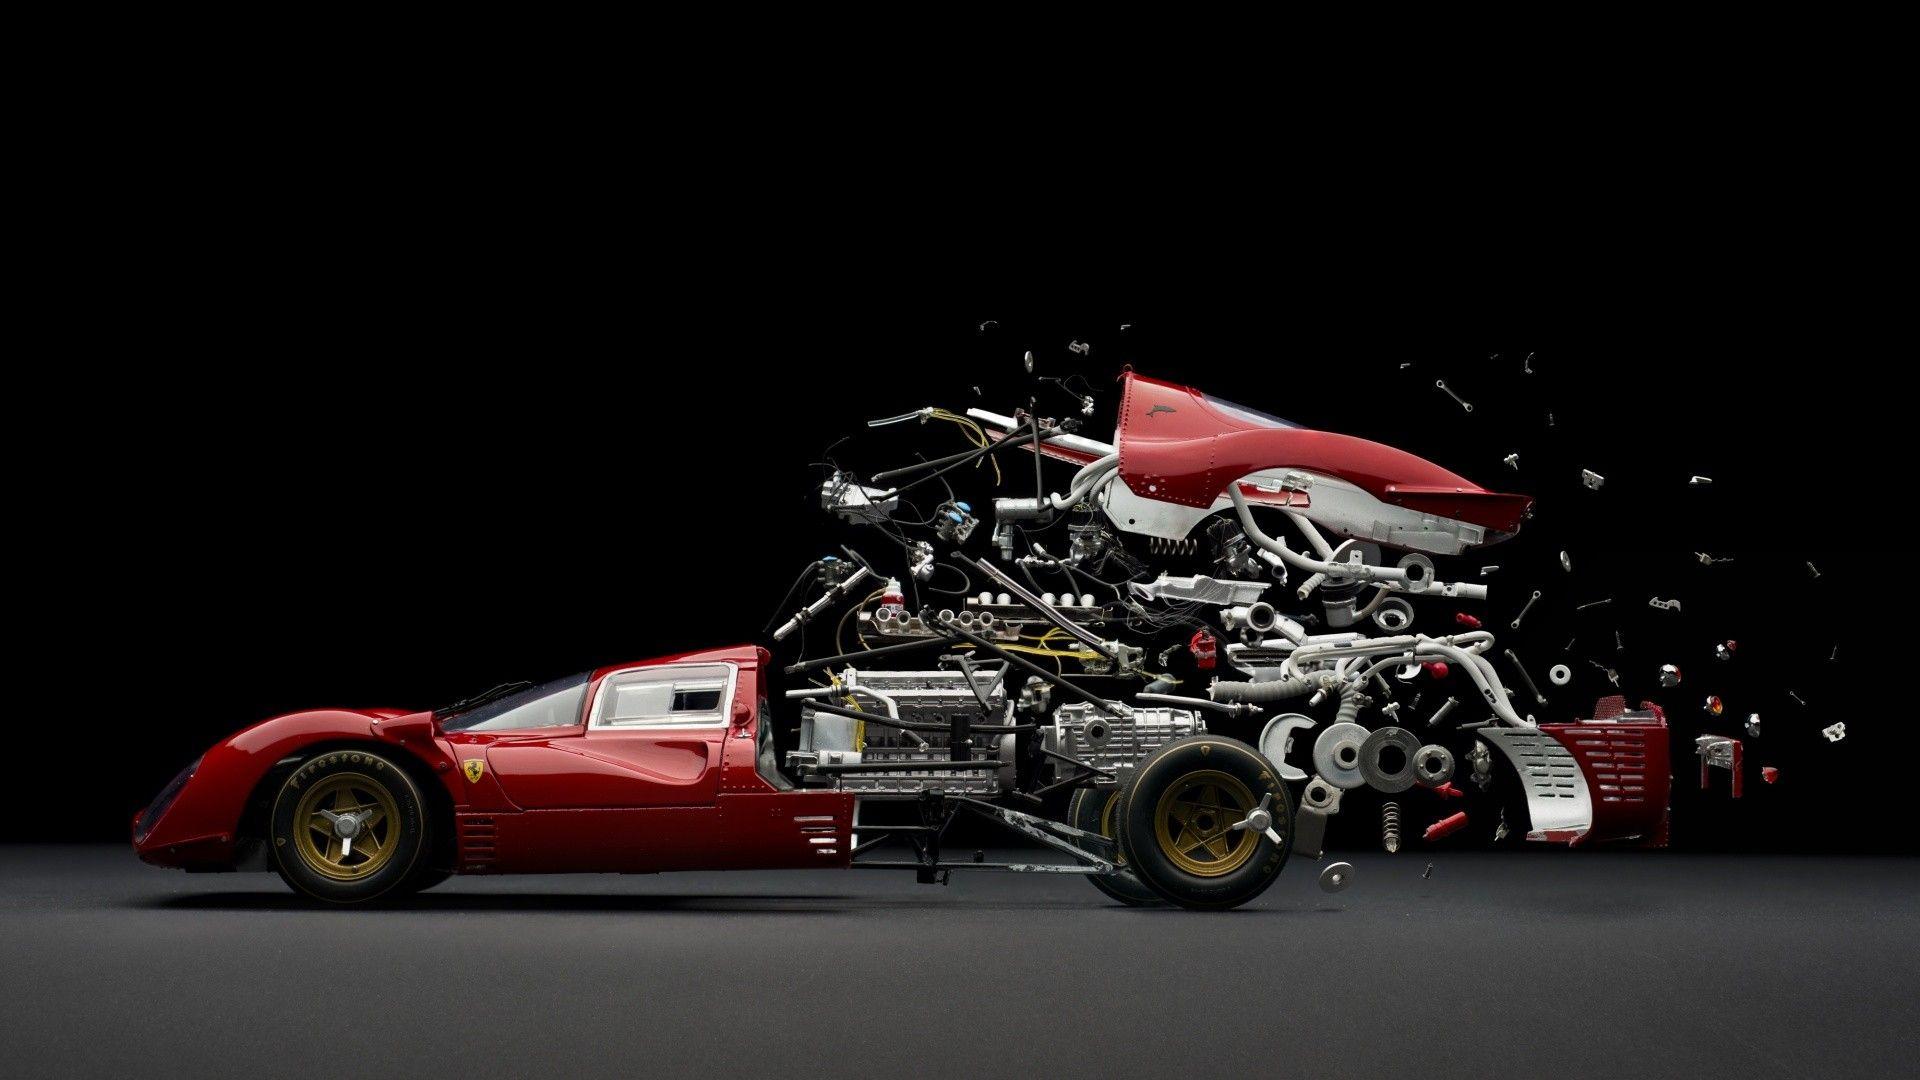 Abstract Car Sports Parts Mechanics Ferrari Exploded View Diagram Maranello Classic Composite Wallpaper Hd